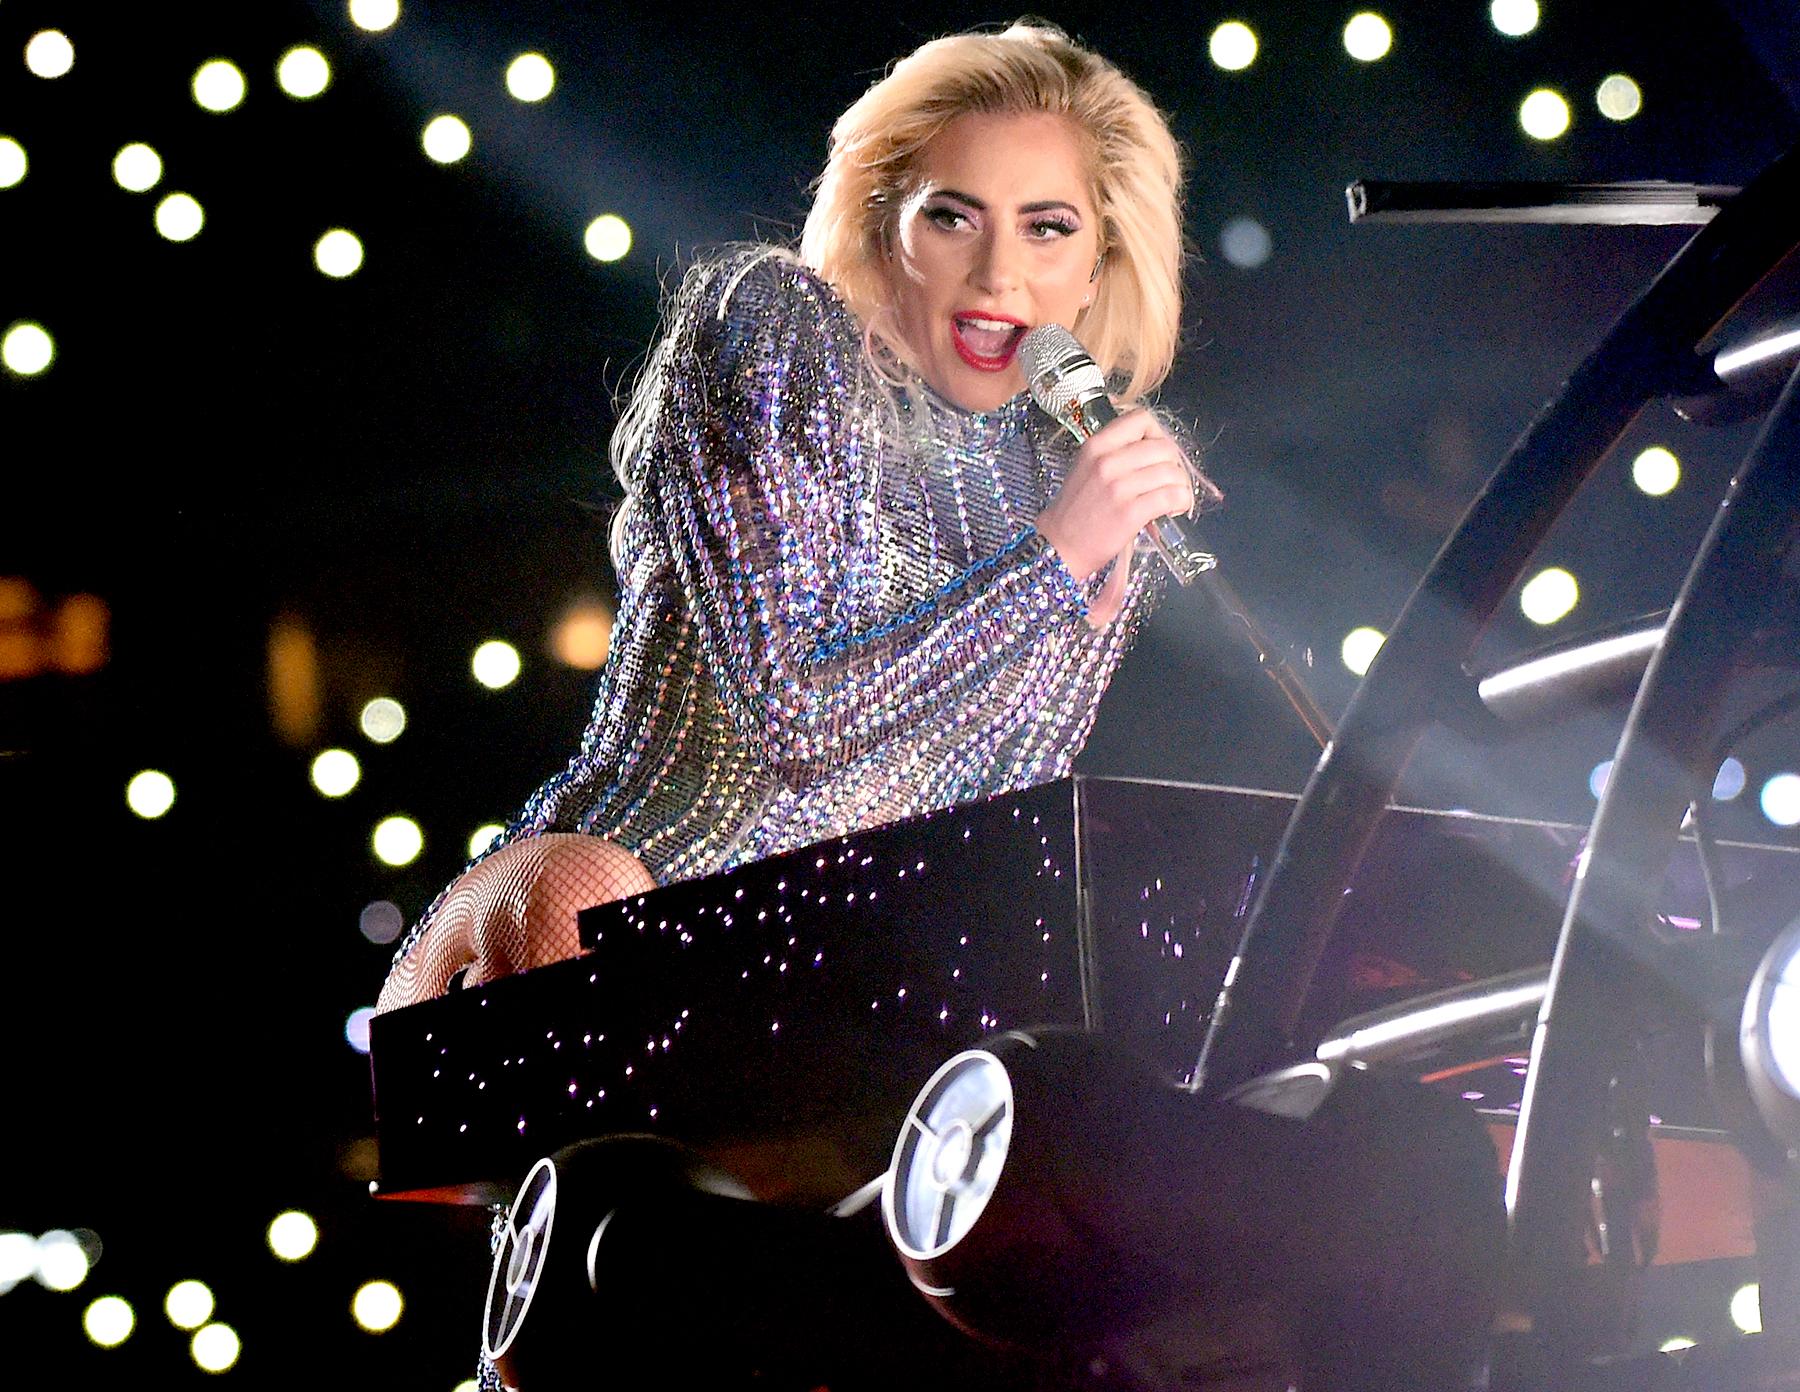 Lady Gaga performs on stage during the Pepsi Zero Sugar Super Bowl LI Halftime Show at NRG Stadium on Feb. 5, 2017, in Houston.